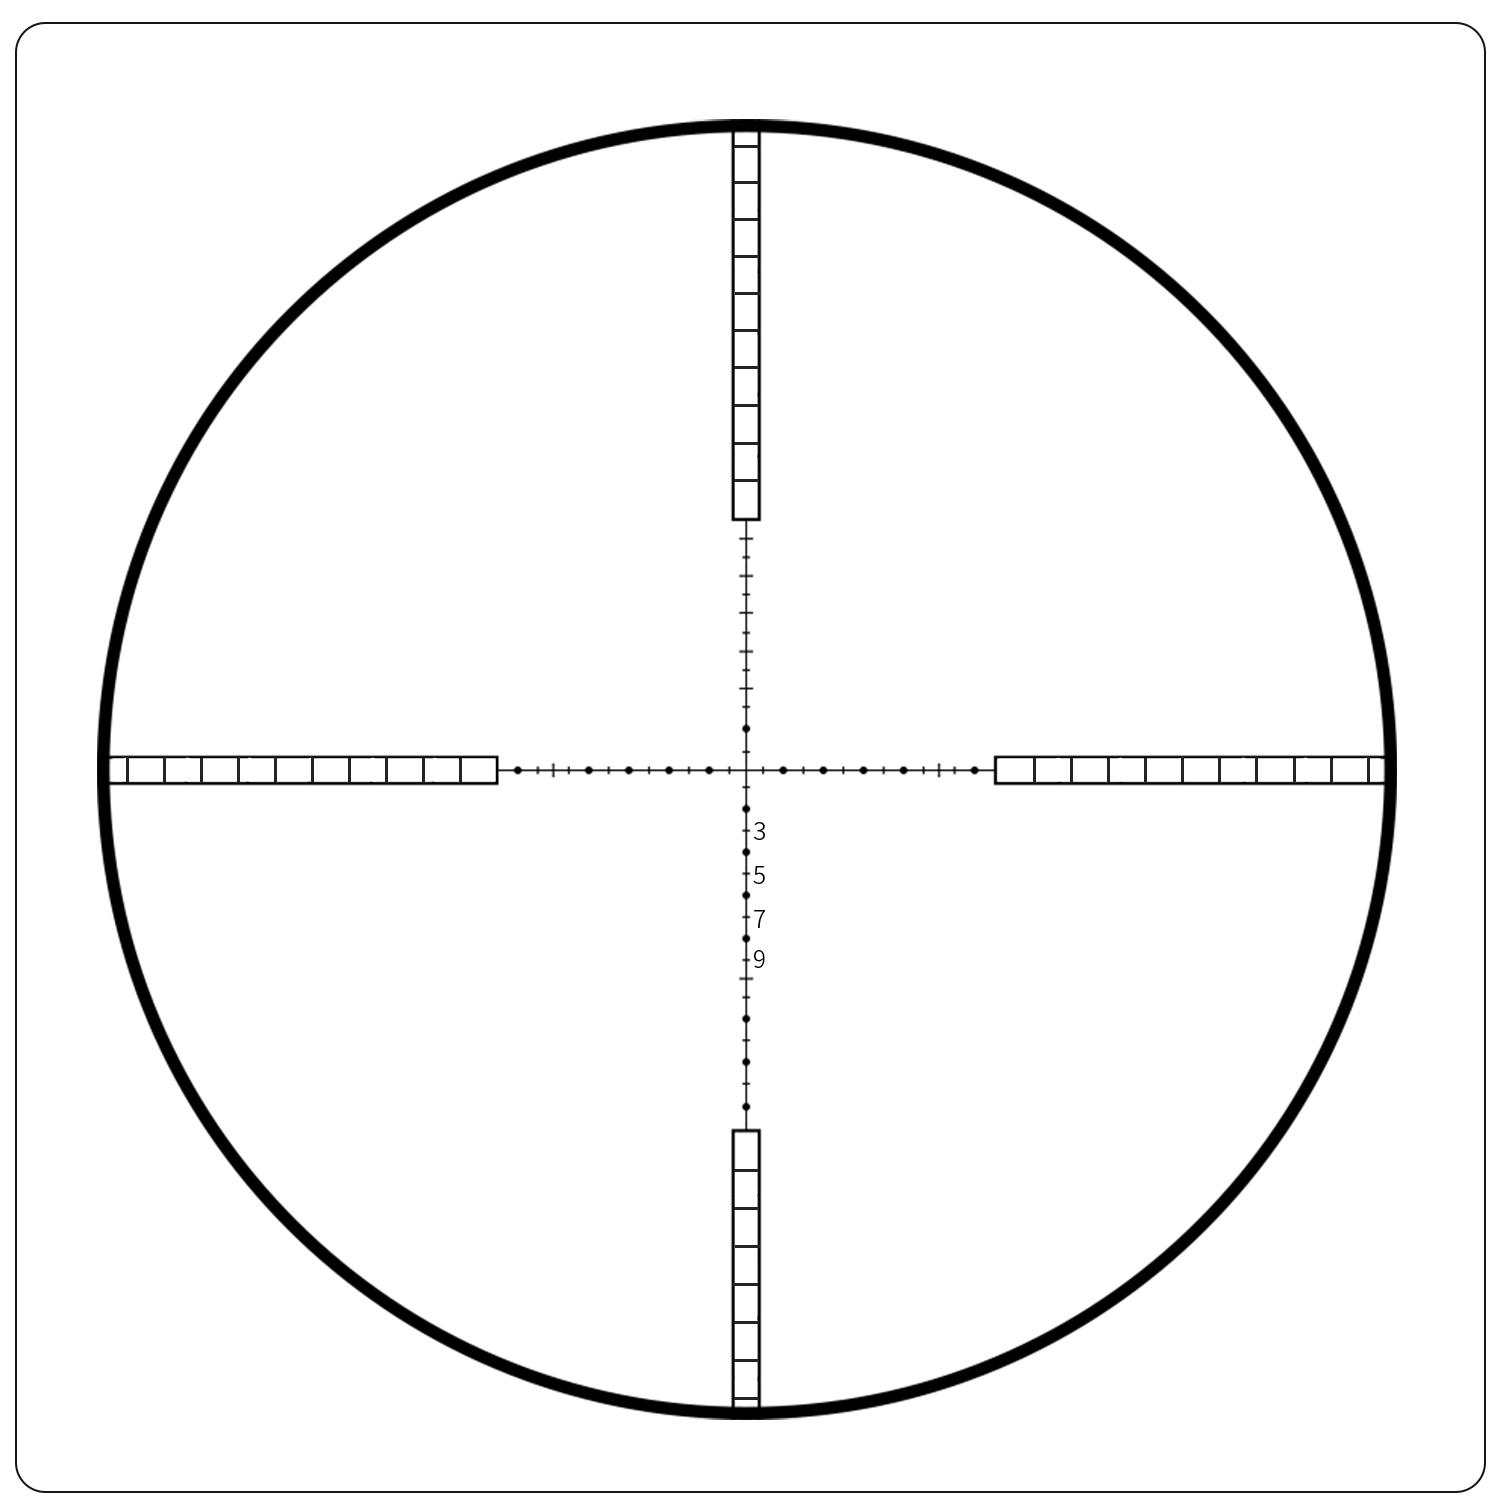 Hb24c8909f5064f85b5f588e6e76f540cE.jpg?width=1500&height=1505&hash=3005